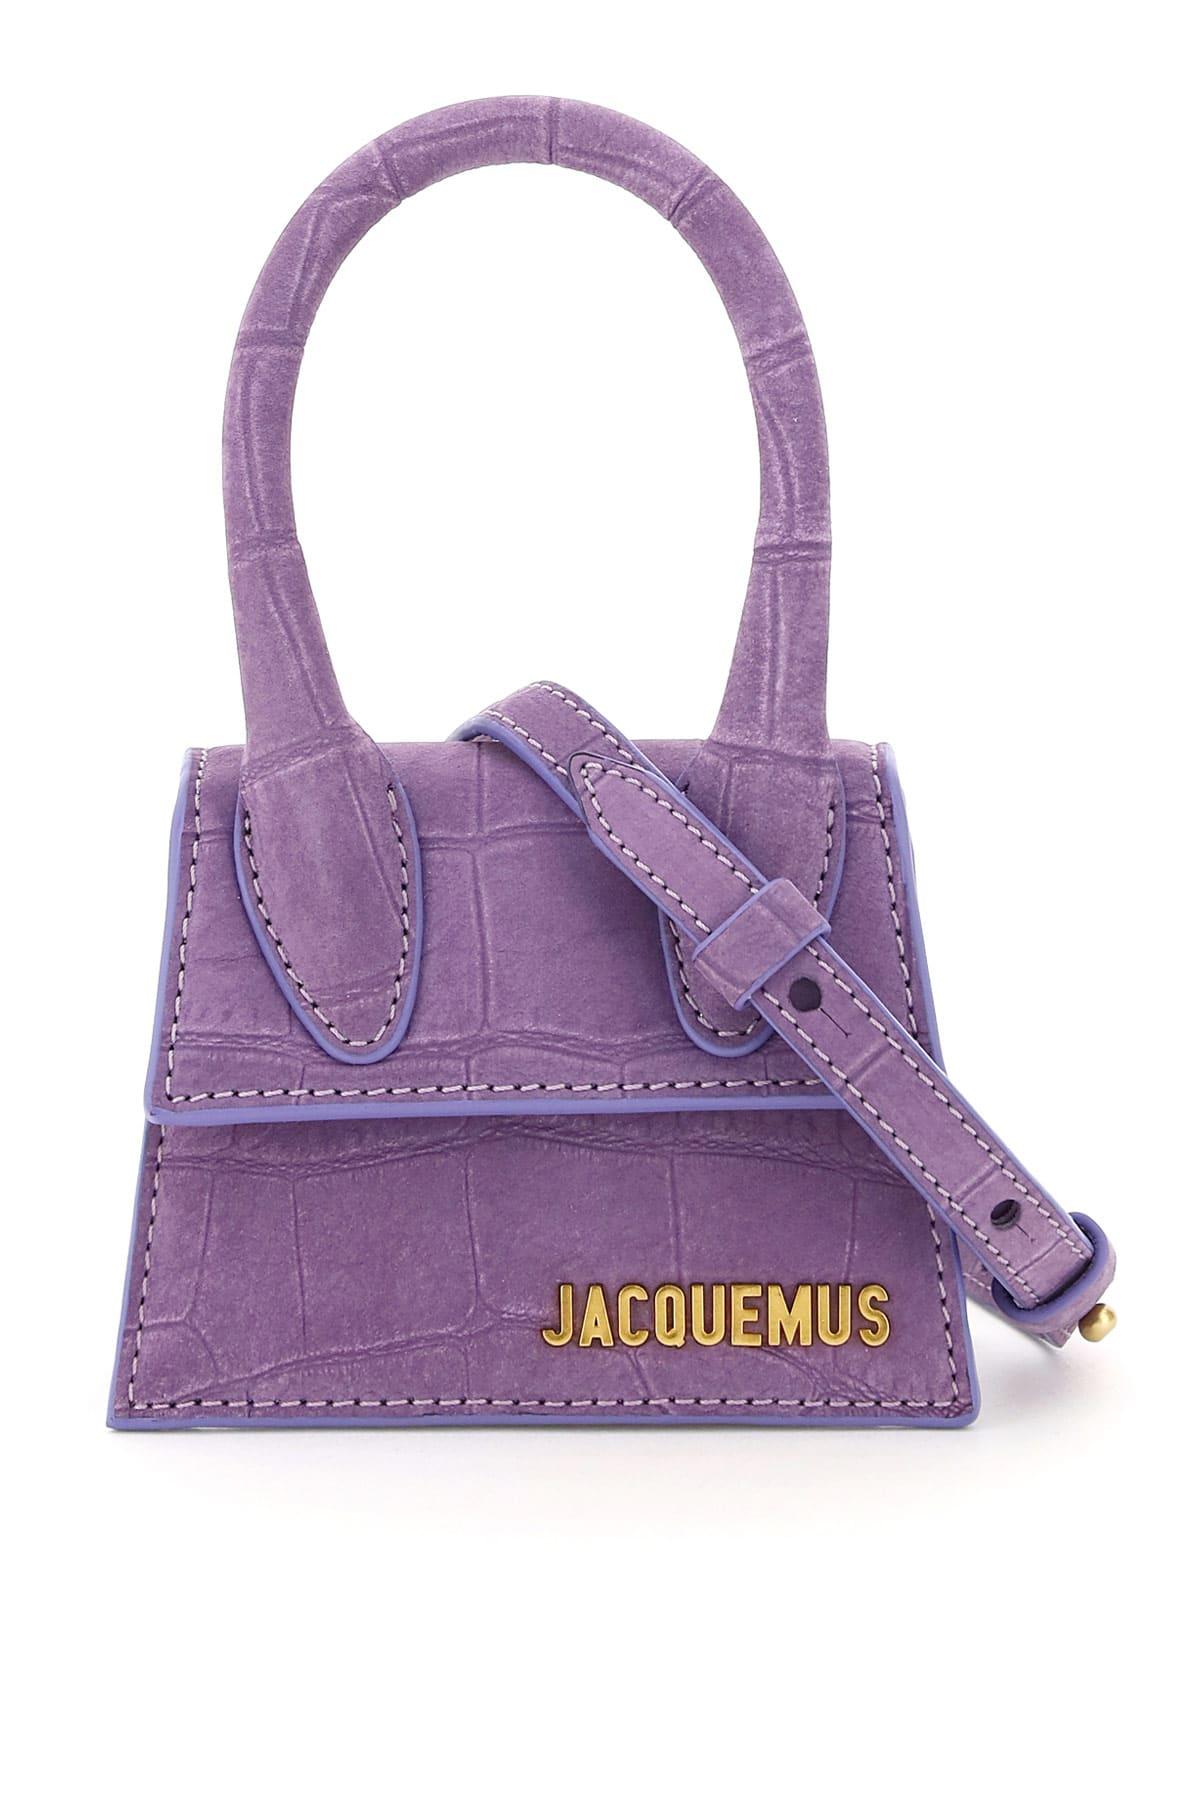 Jacquemus Bags LE CHIQUITO MICRO BAG